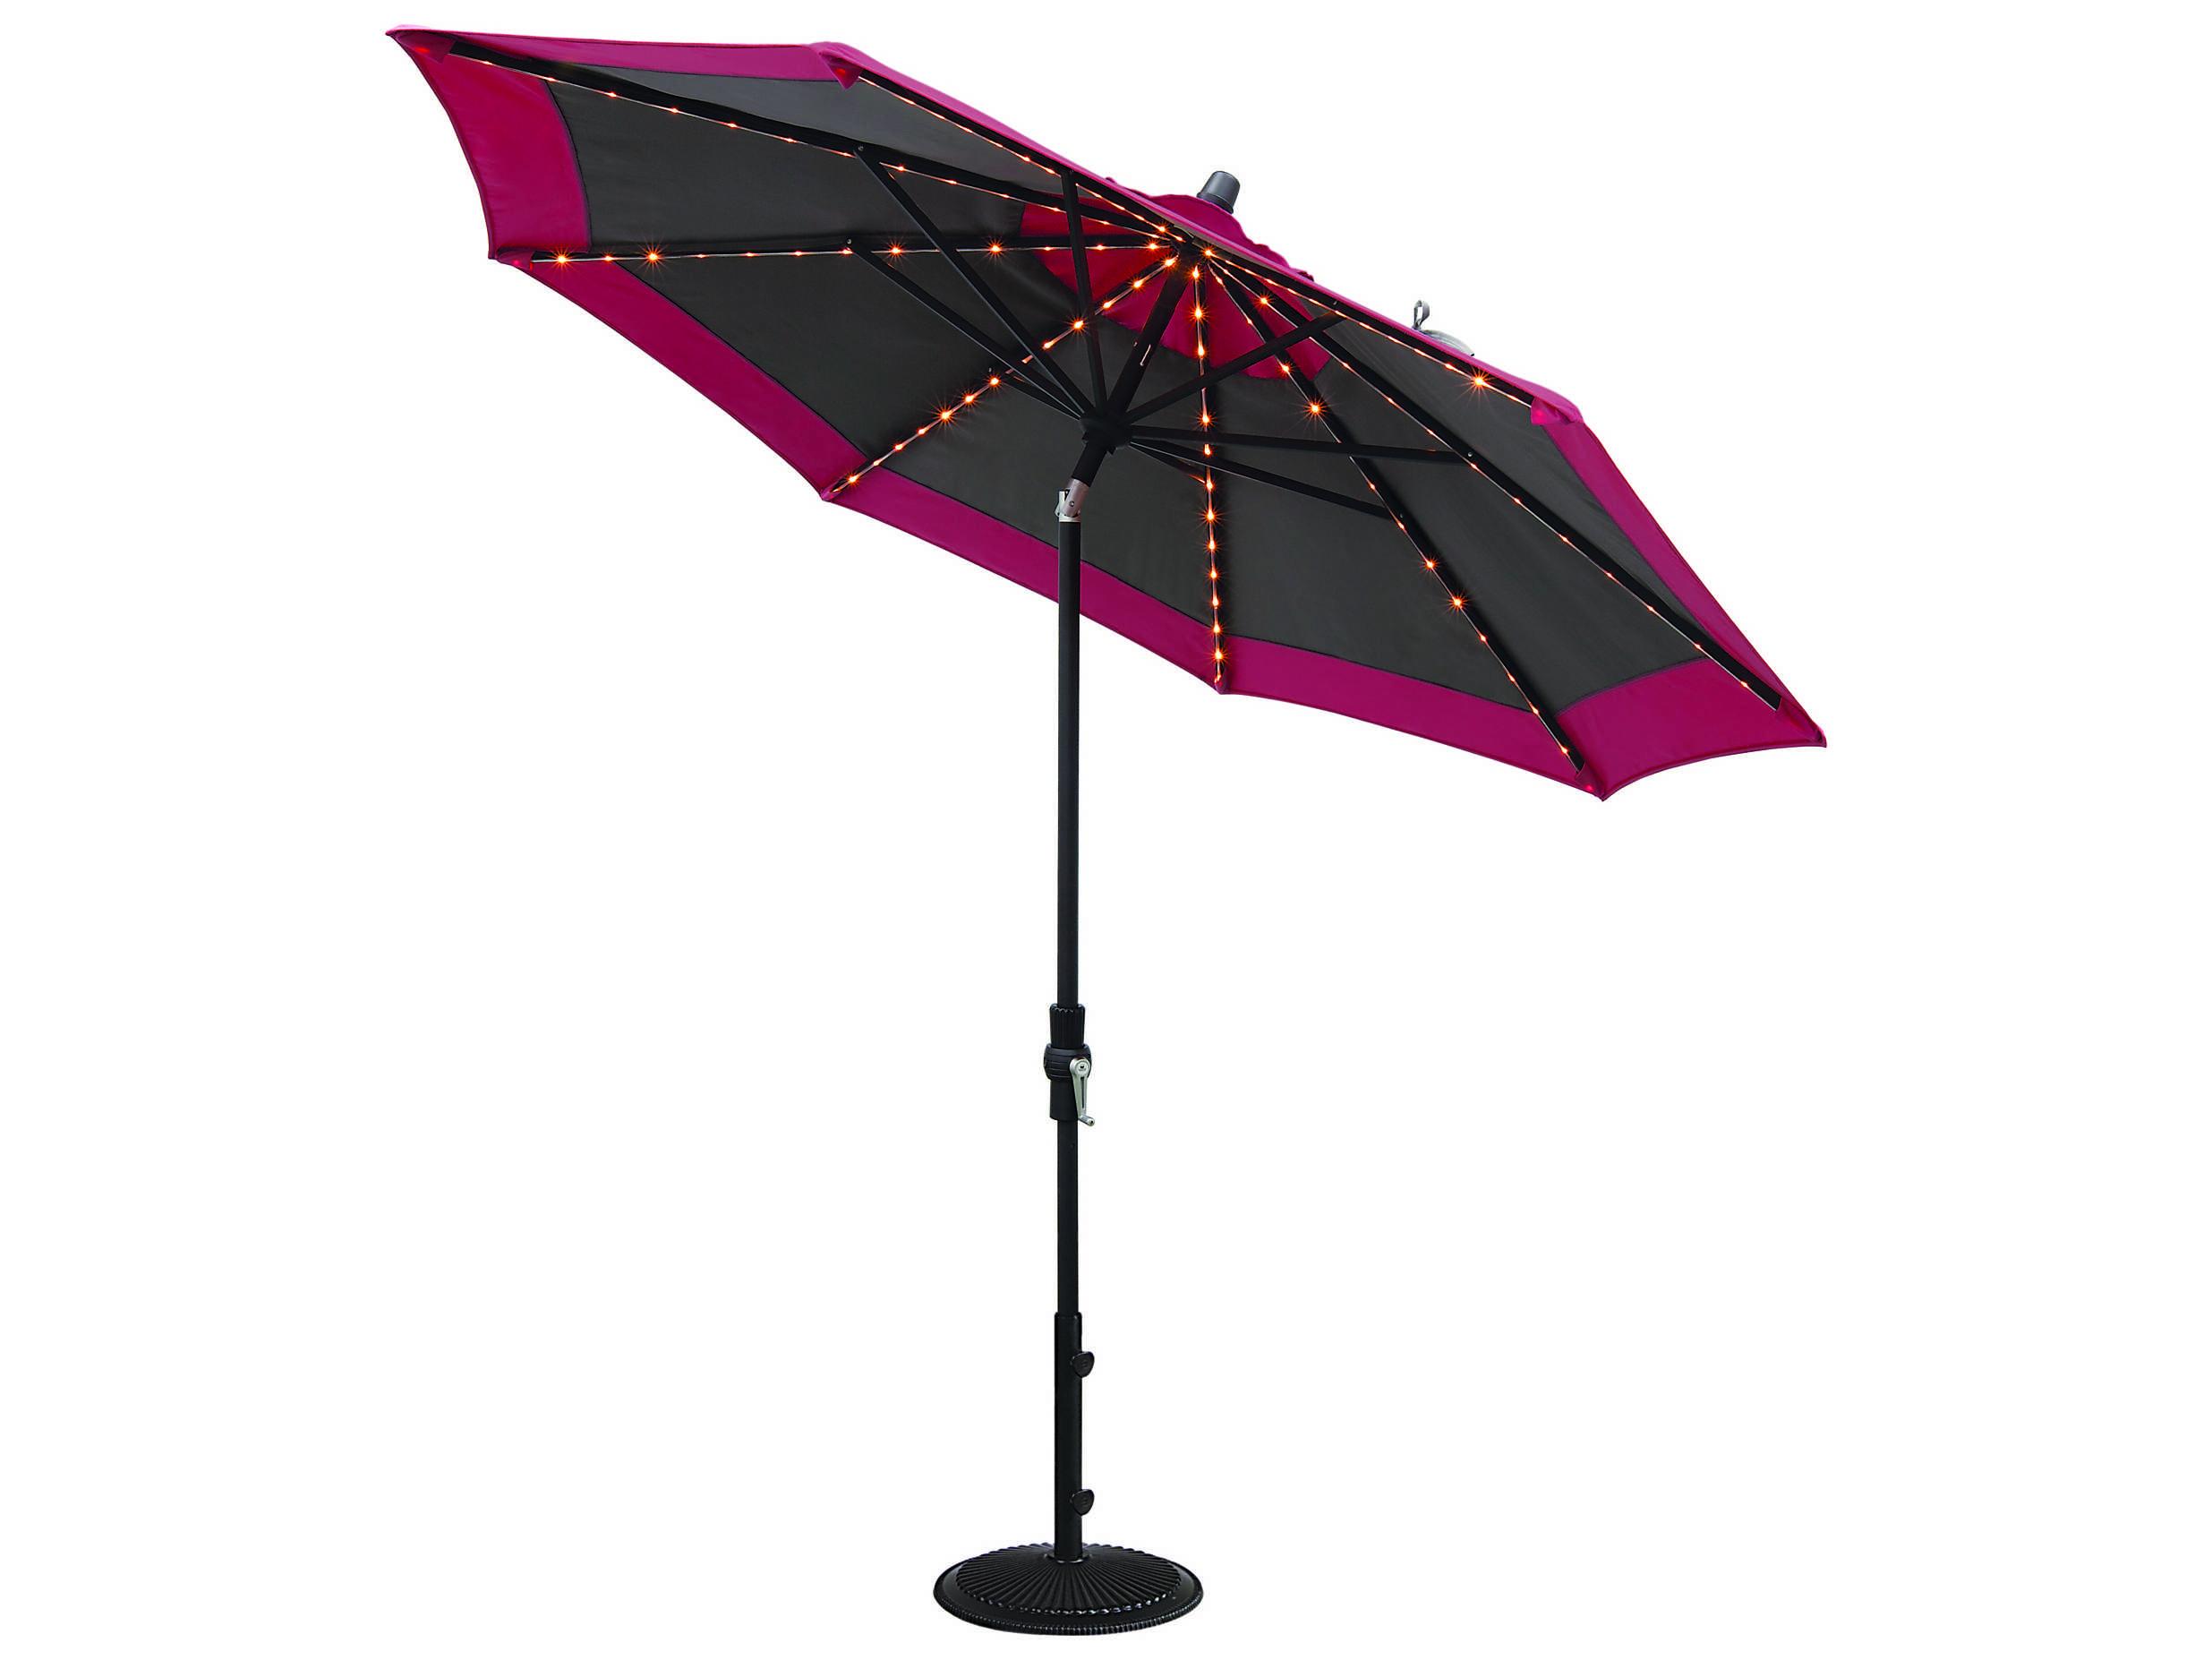 Treasure Garden Quick Ship Market Aluminum 9 Foot Collar Tilt Crank Lift Starlight Umbrella